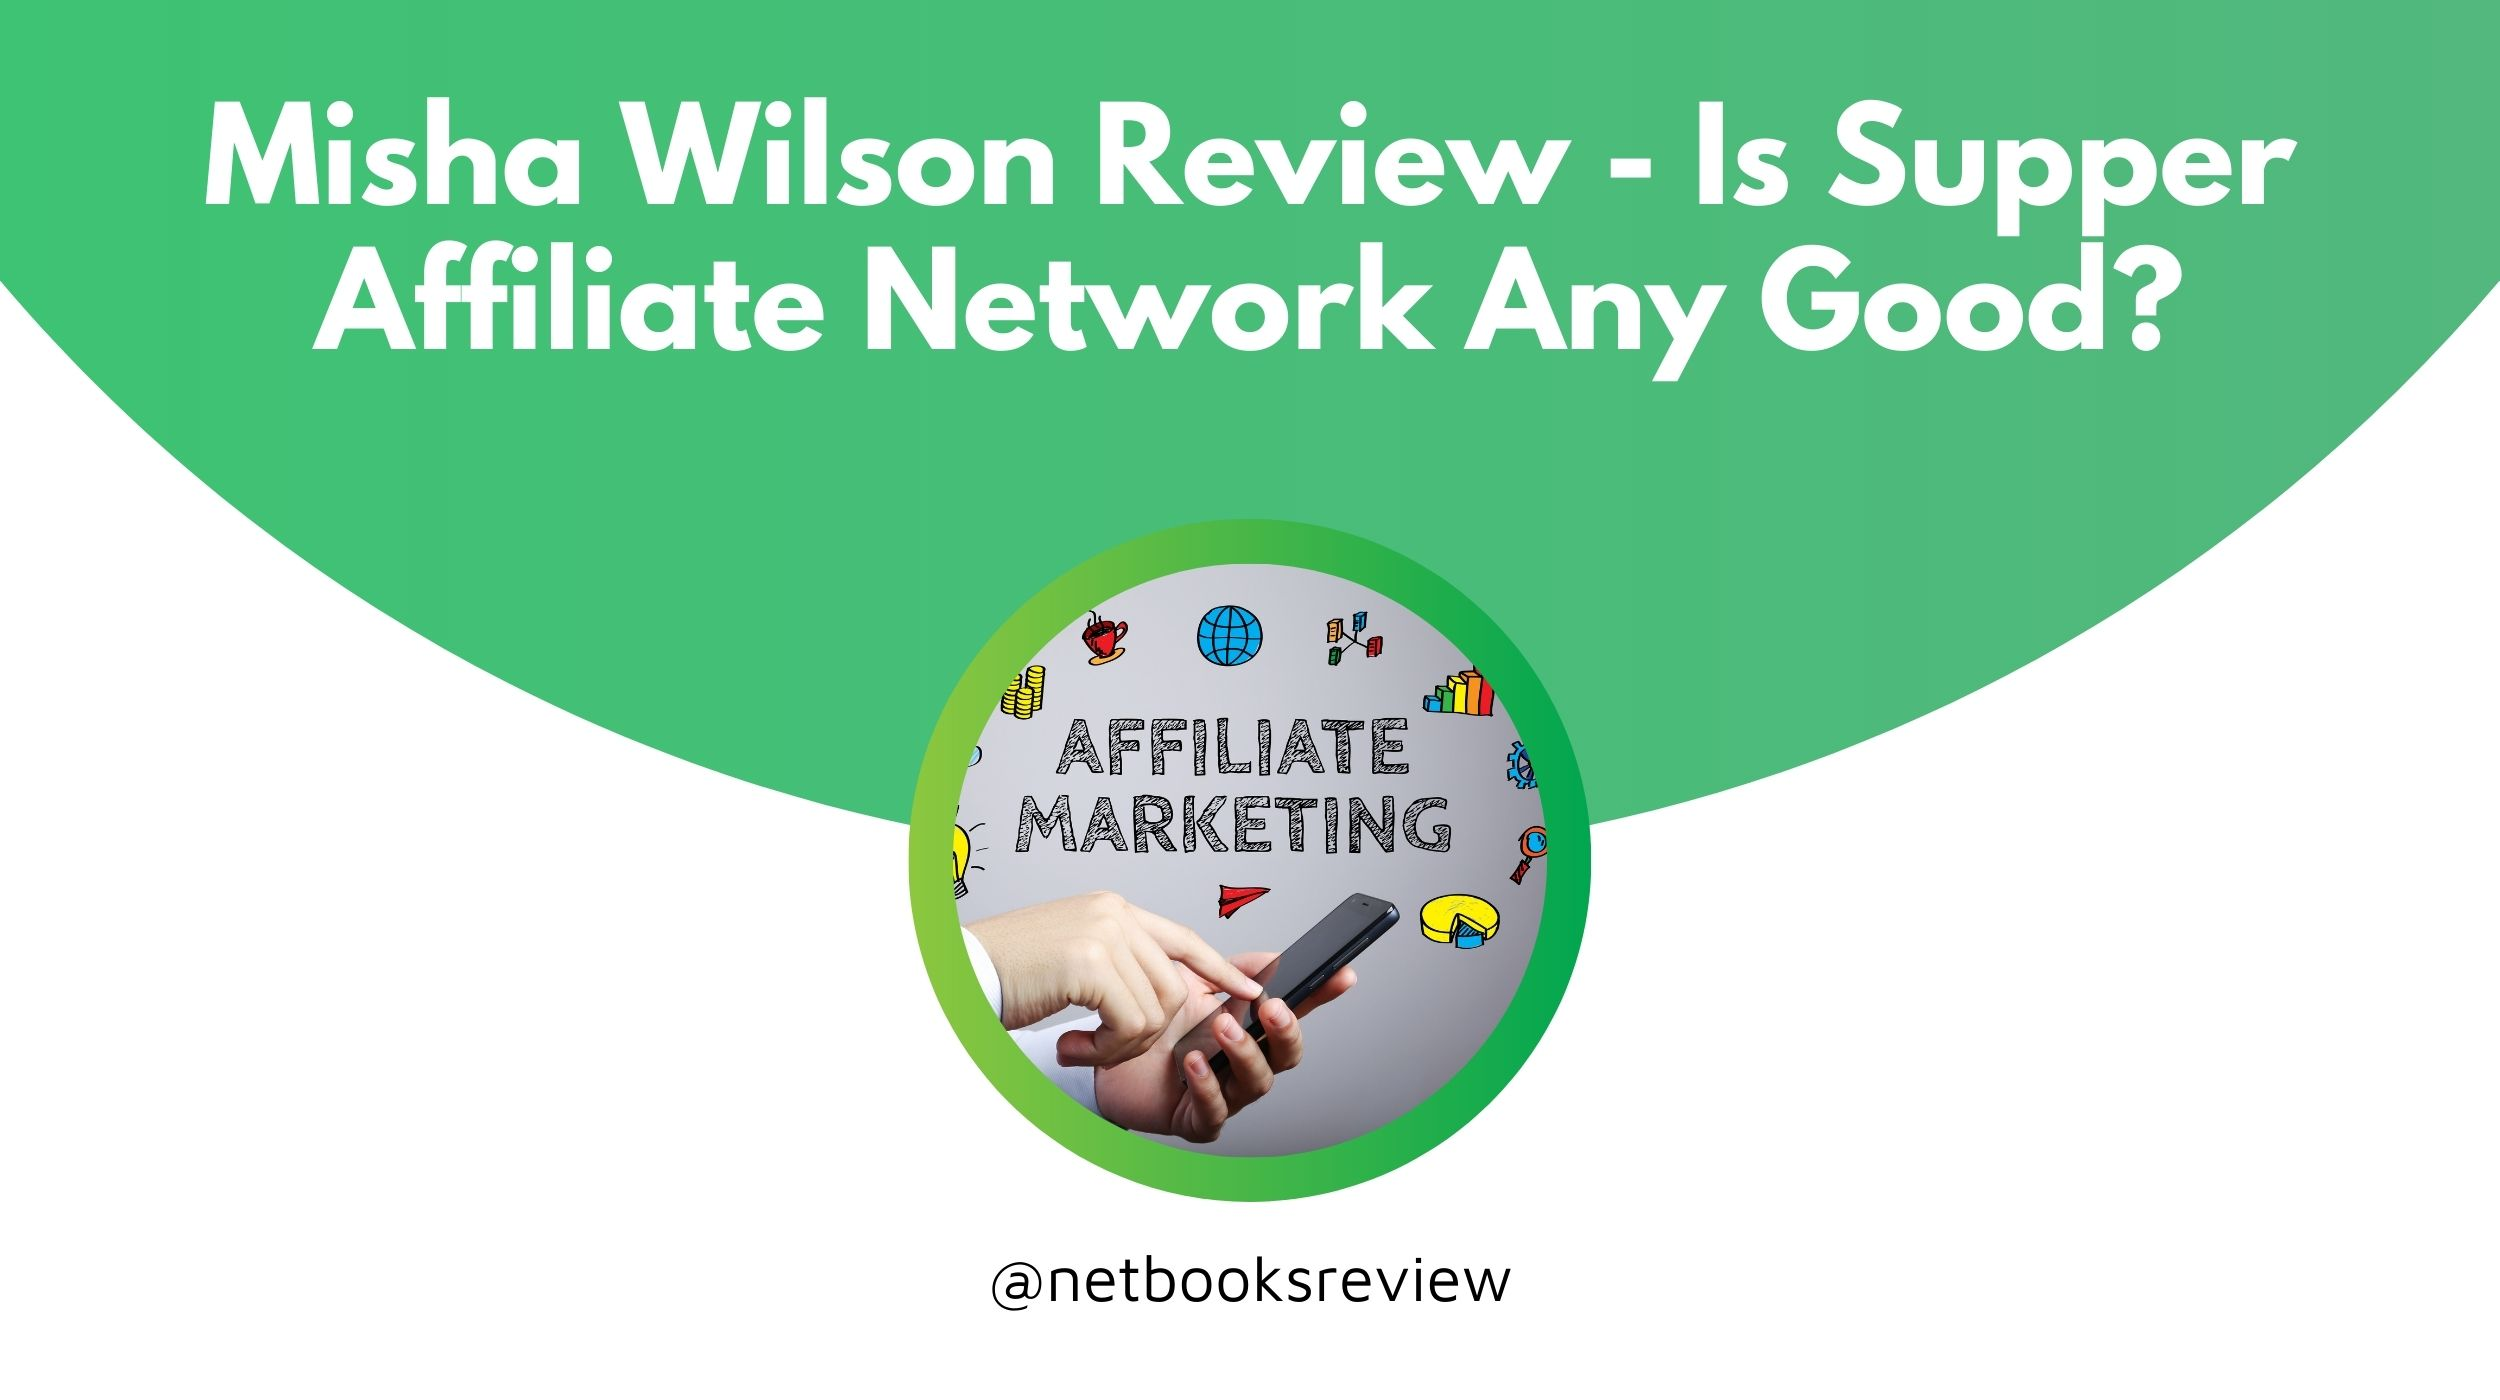 misha wilson review